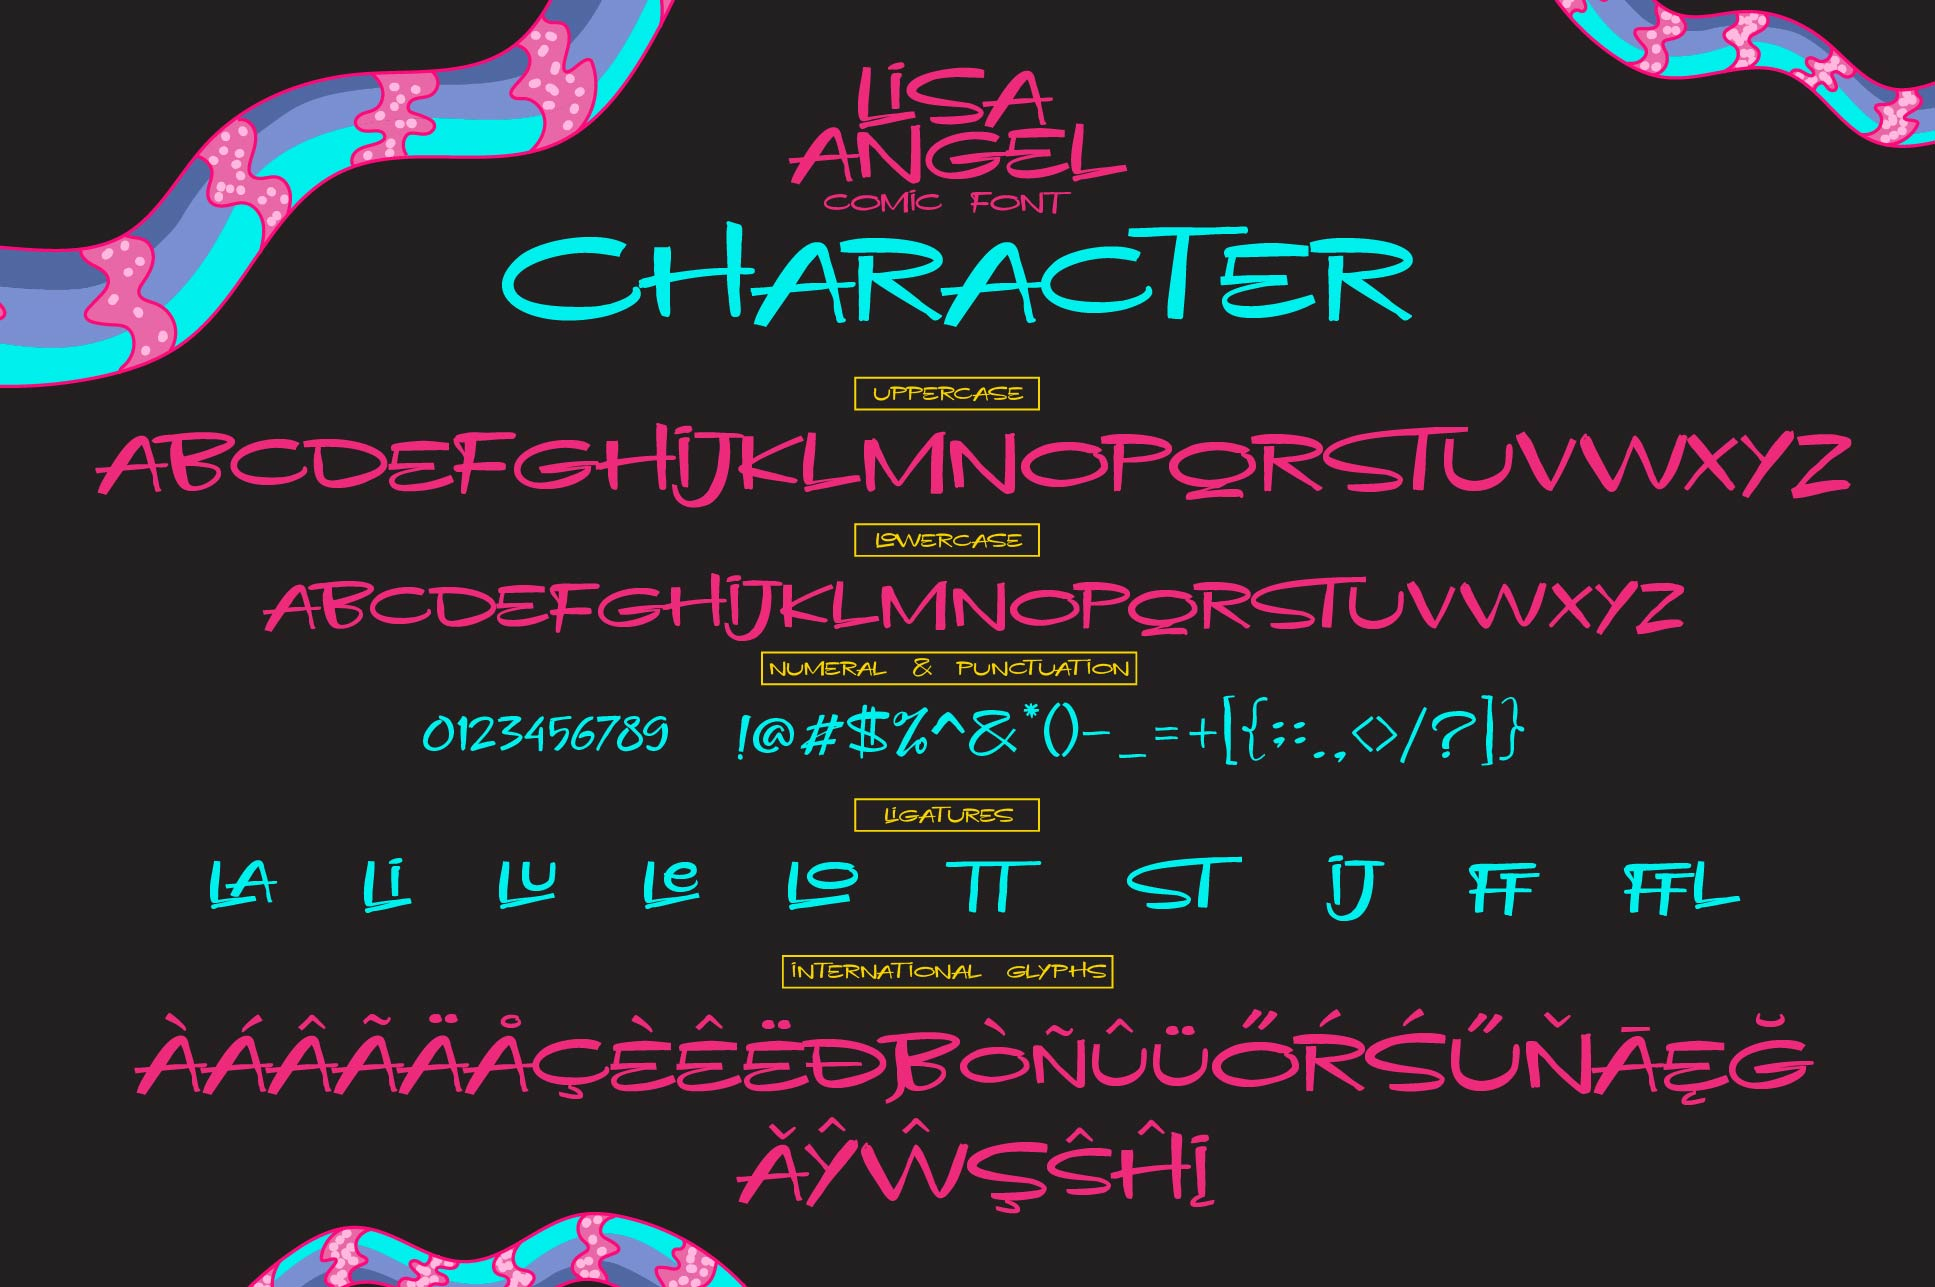 LISA ANGEL - comic font example image 8